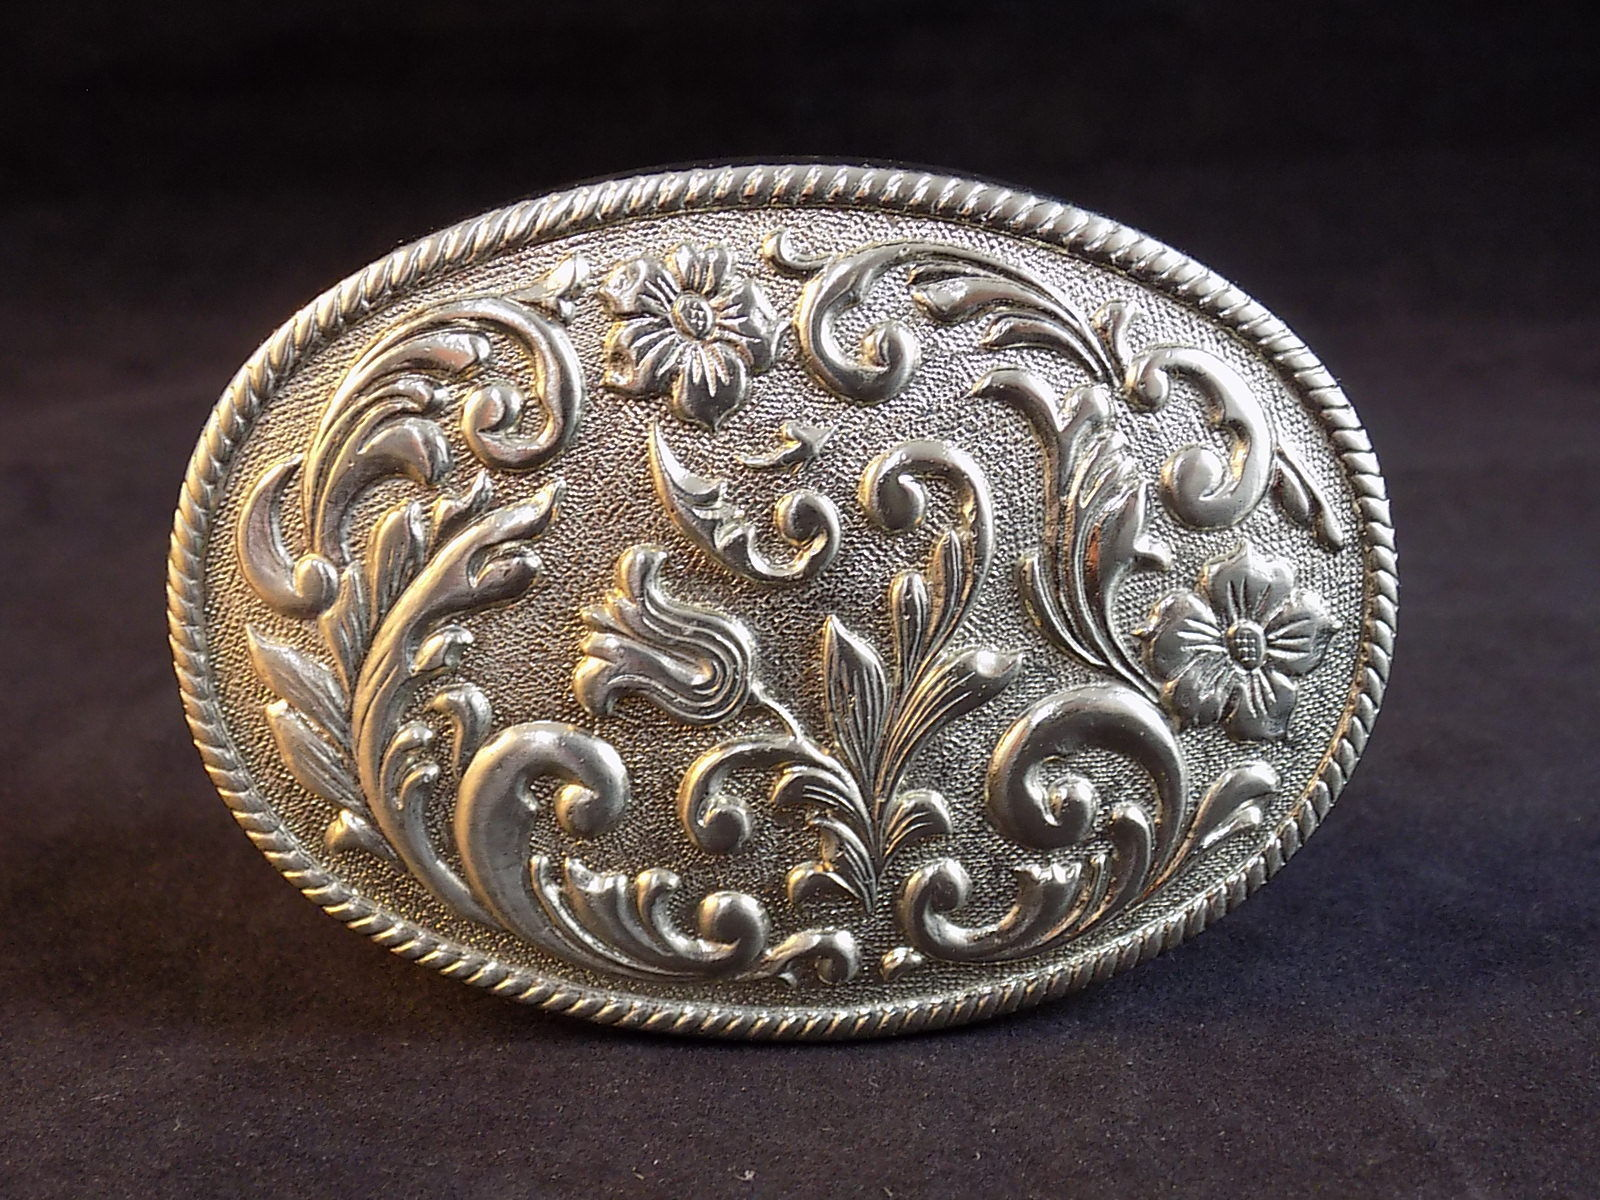 US Stock New Vintage Western Rope Horse Cowboy Oval Belt Buckle